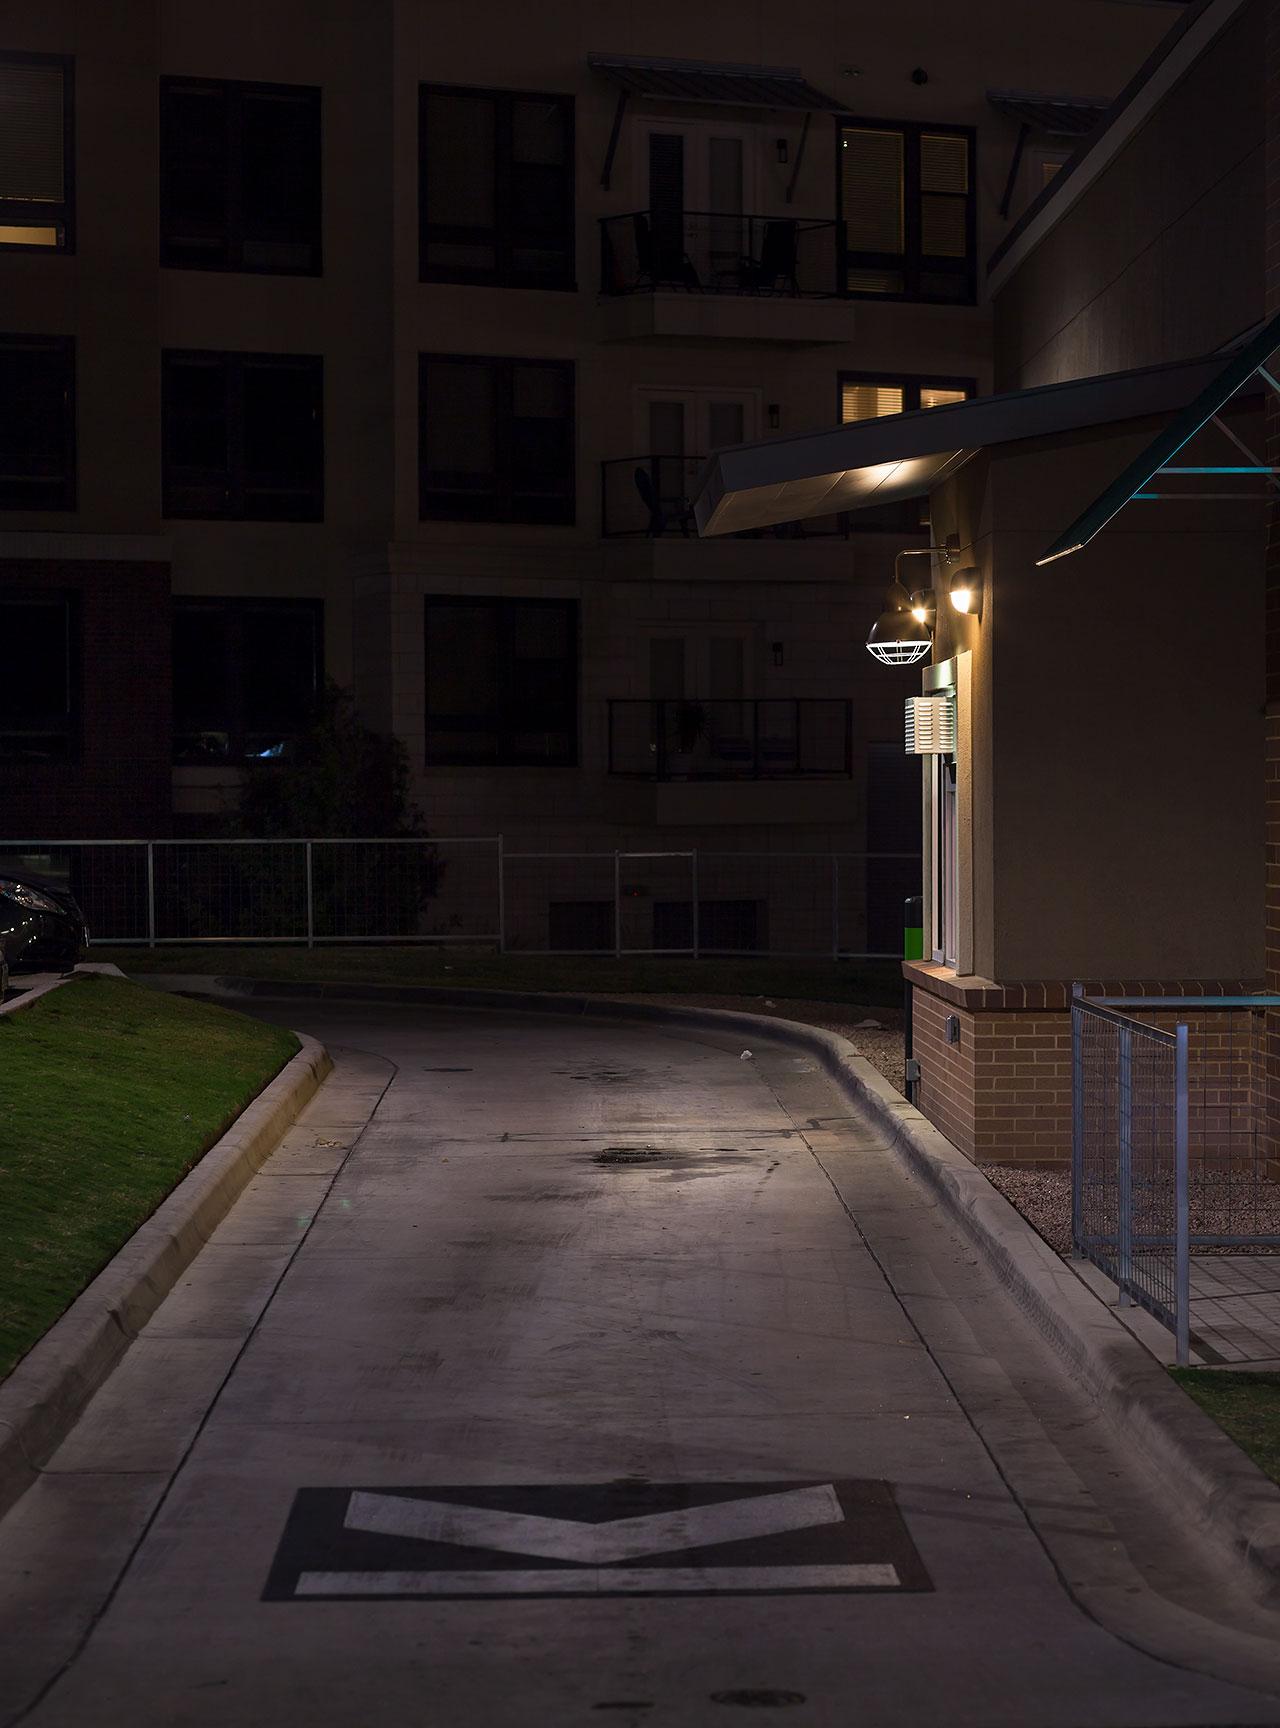 Mario Brand - Driveland - Felix Schoeller Photoaward